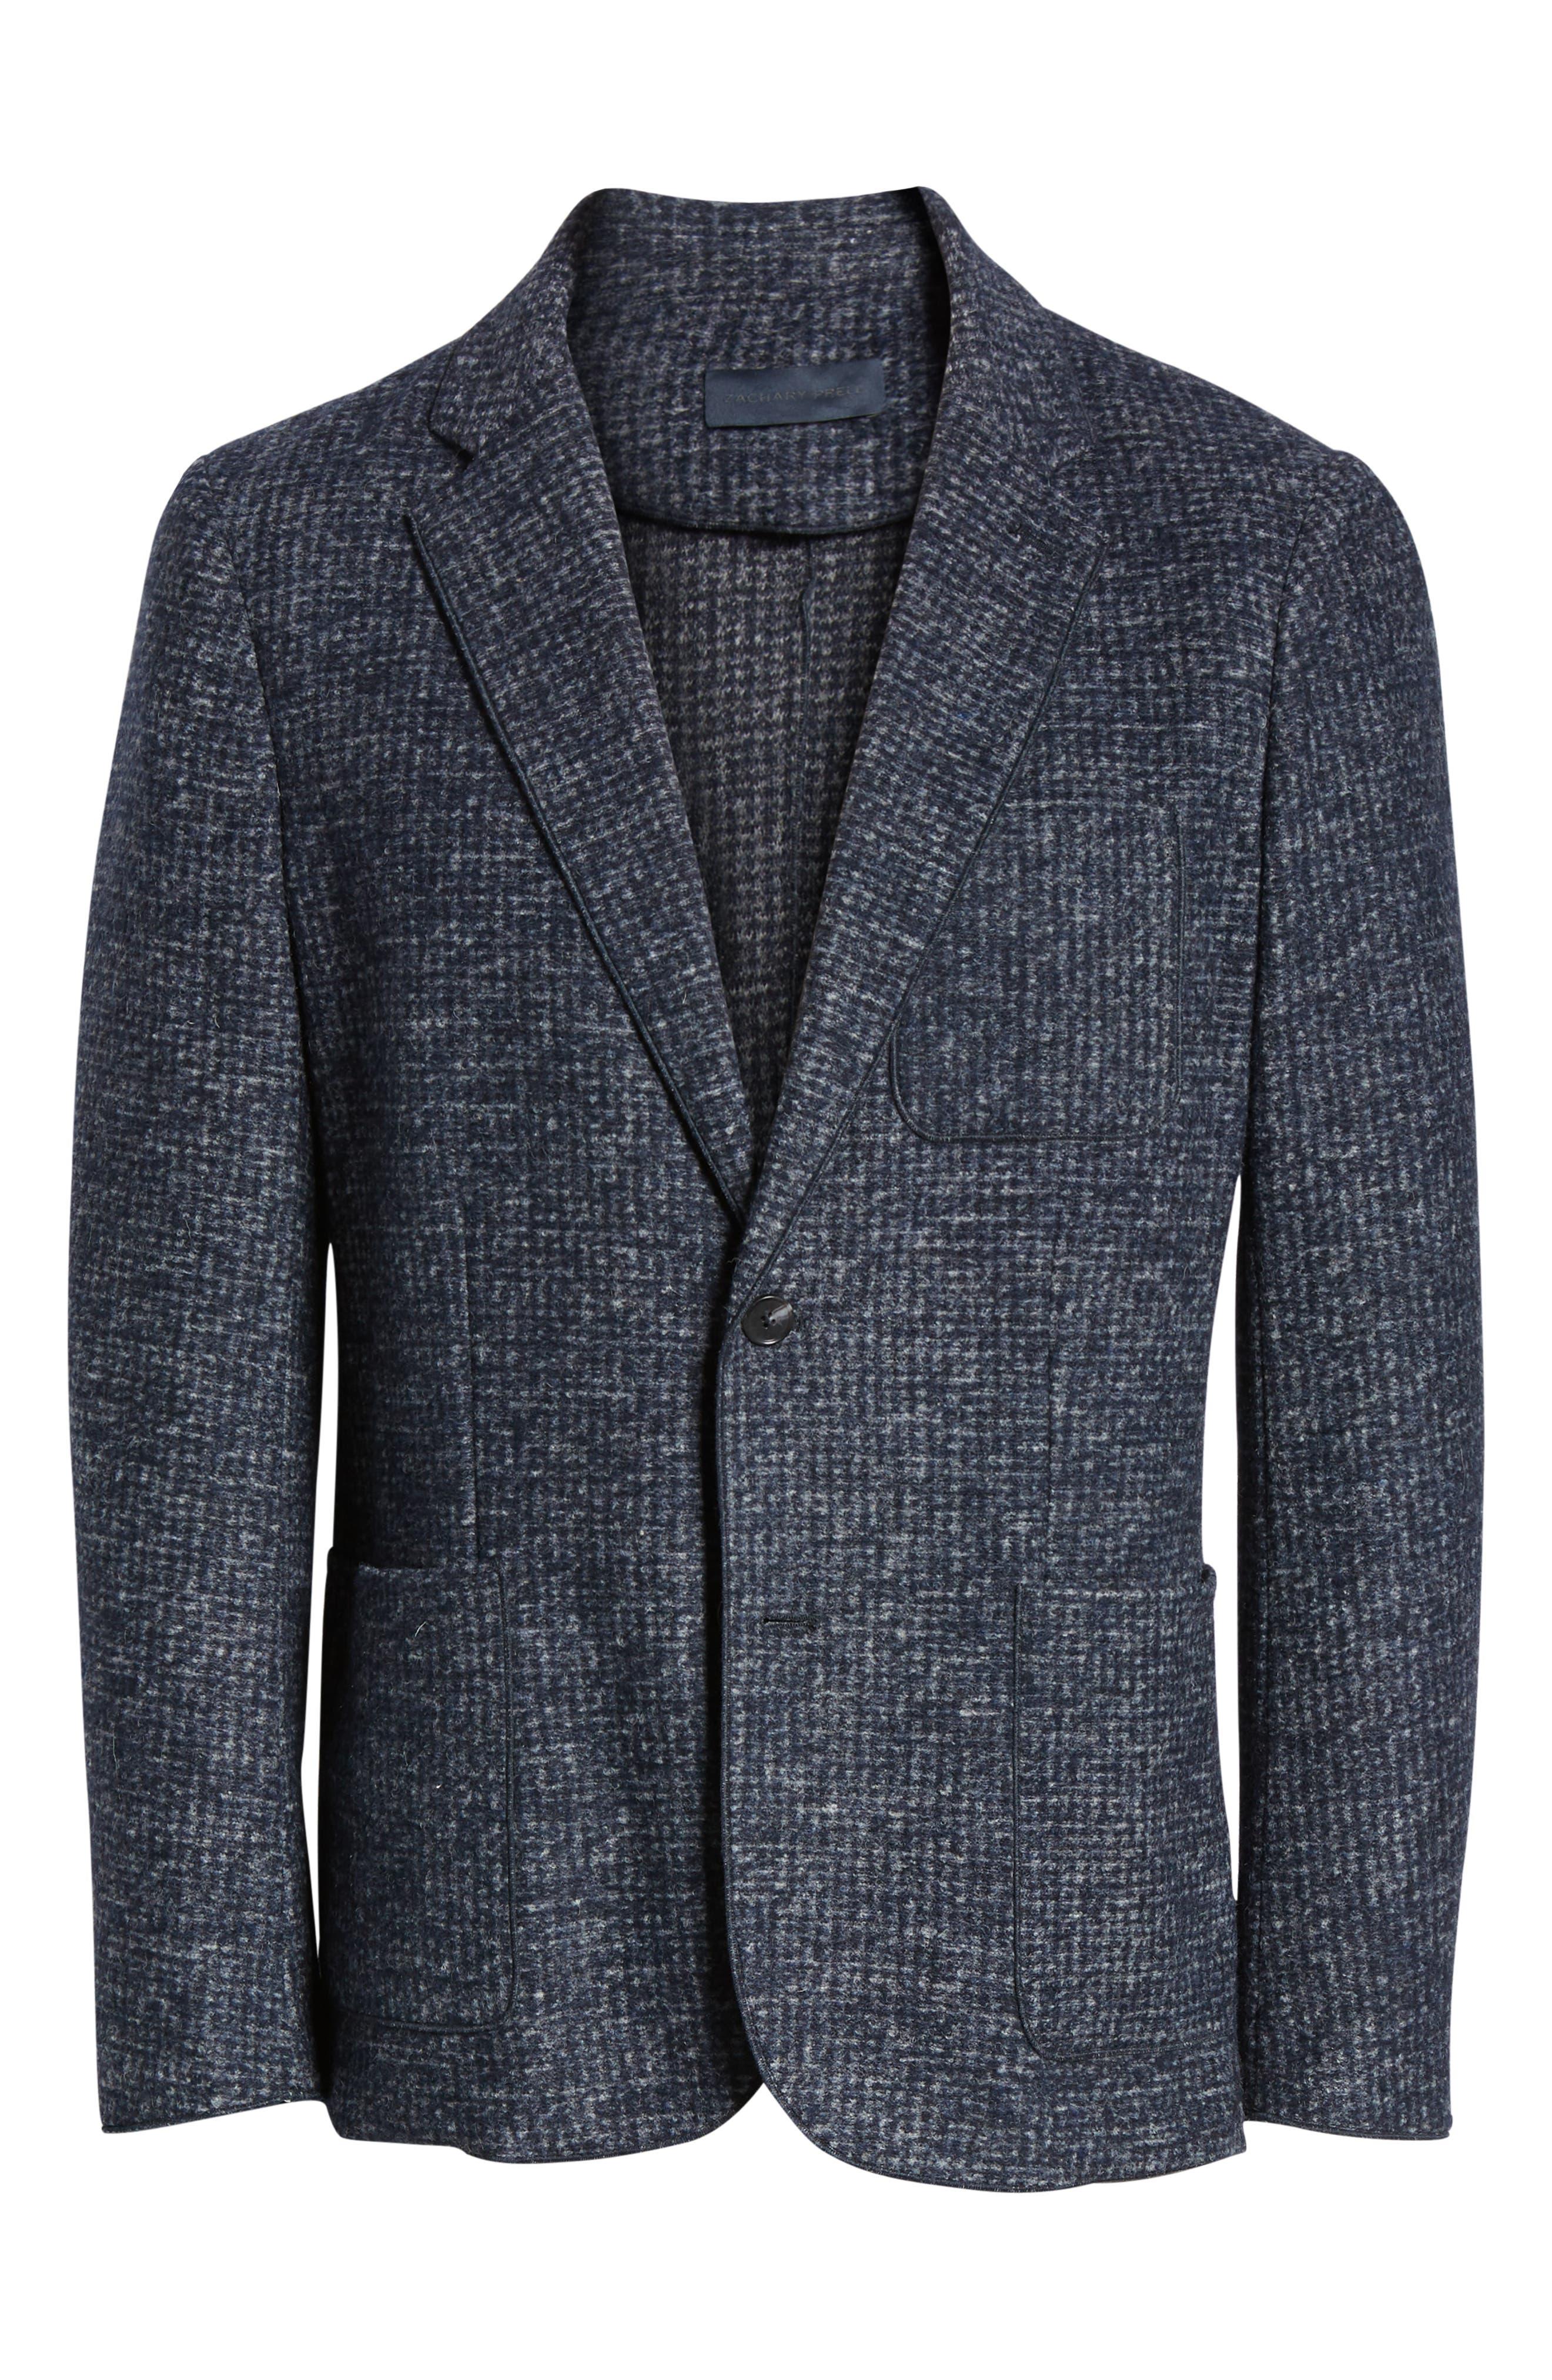 Randolph Houndstooth Knit Sport Coat,                             Alternate thumbnail 5, color,                             DARK BLUE